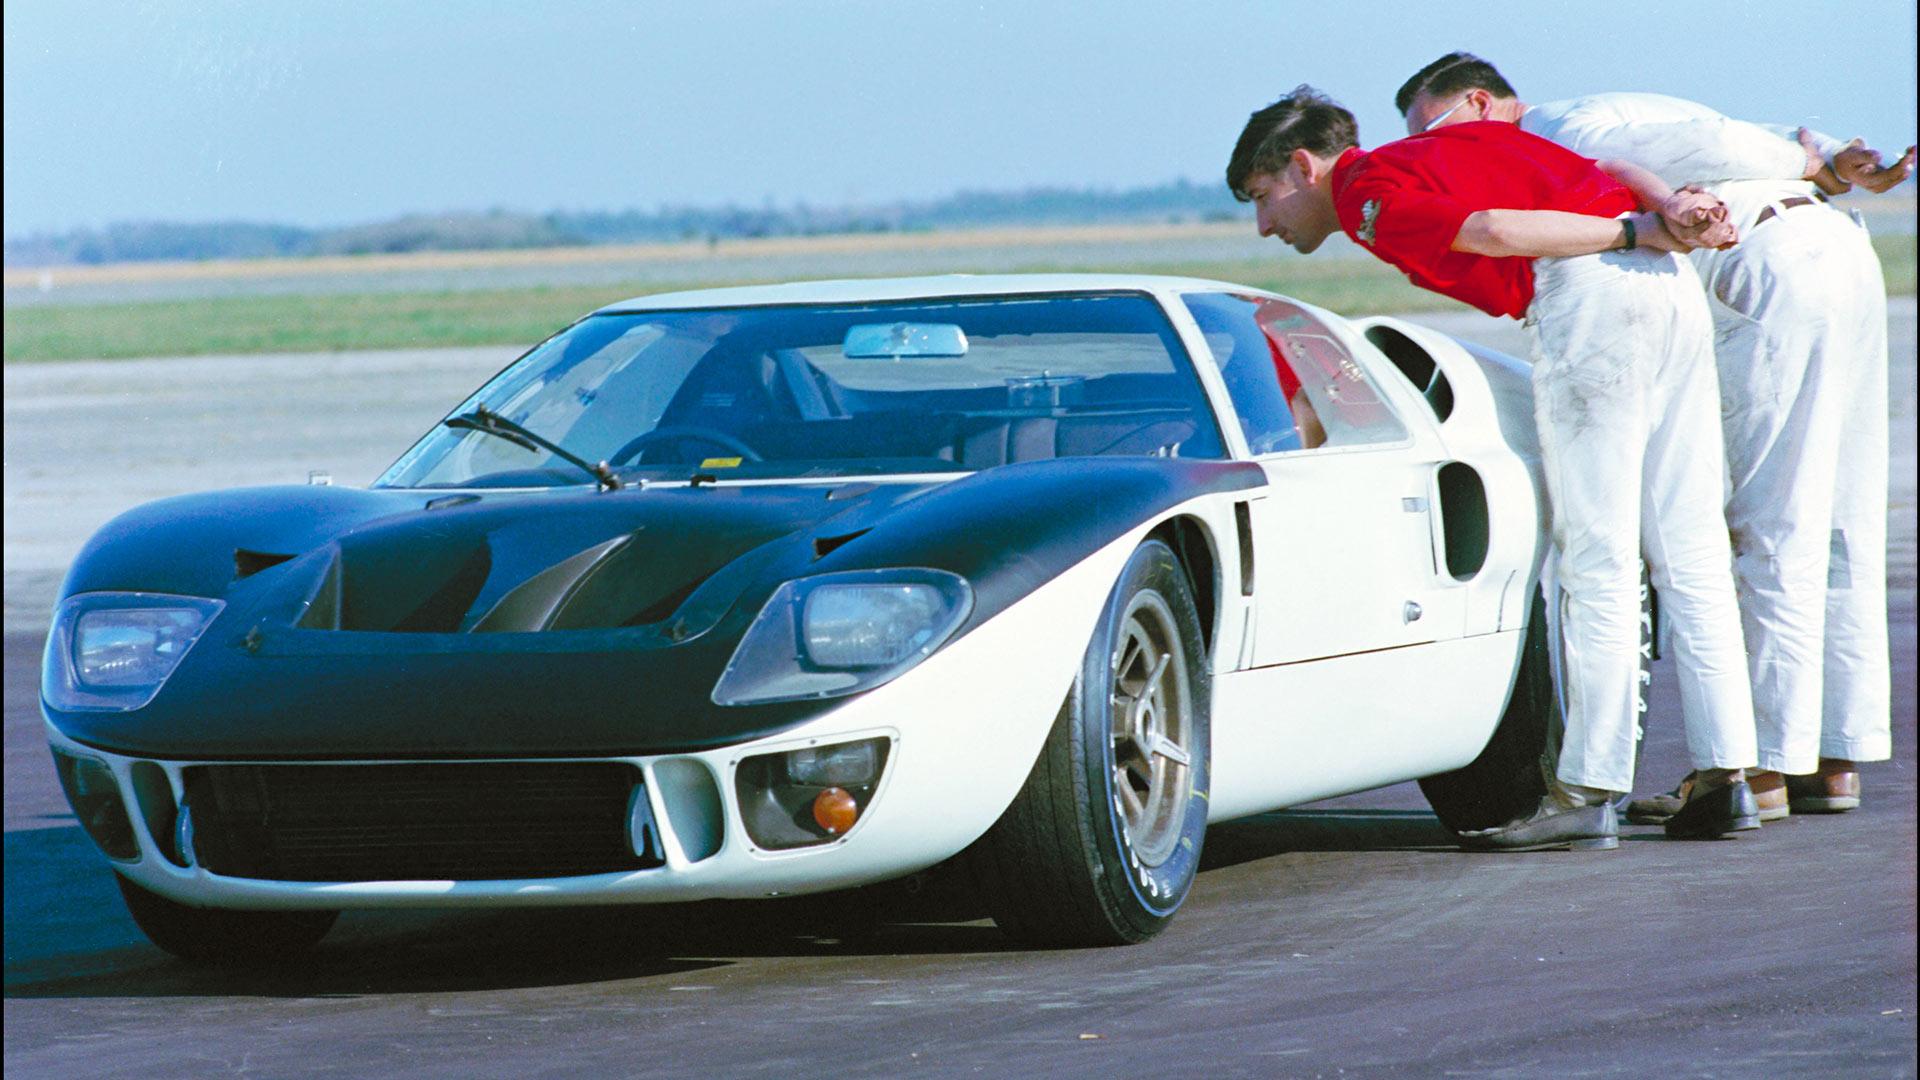 A new hope: the 1966 Ford GT40 Mk II